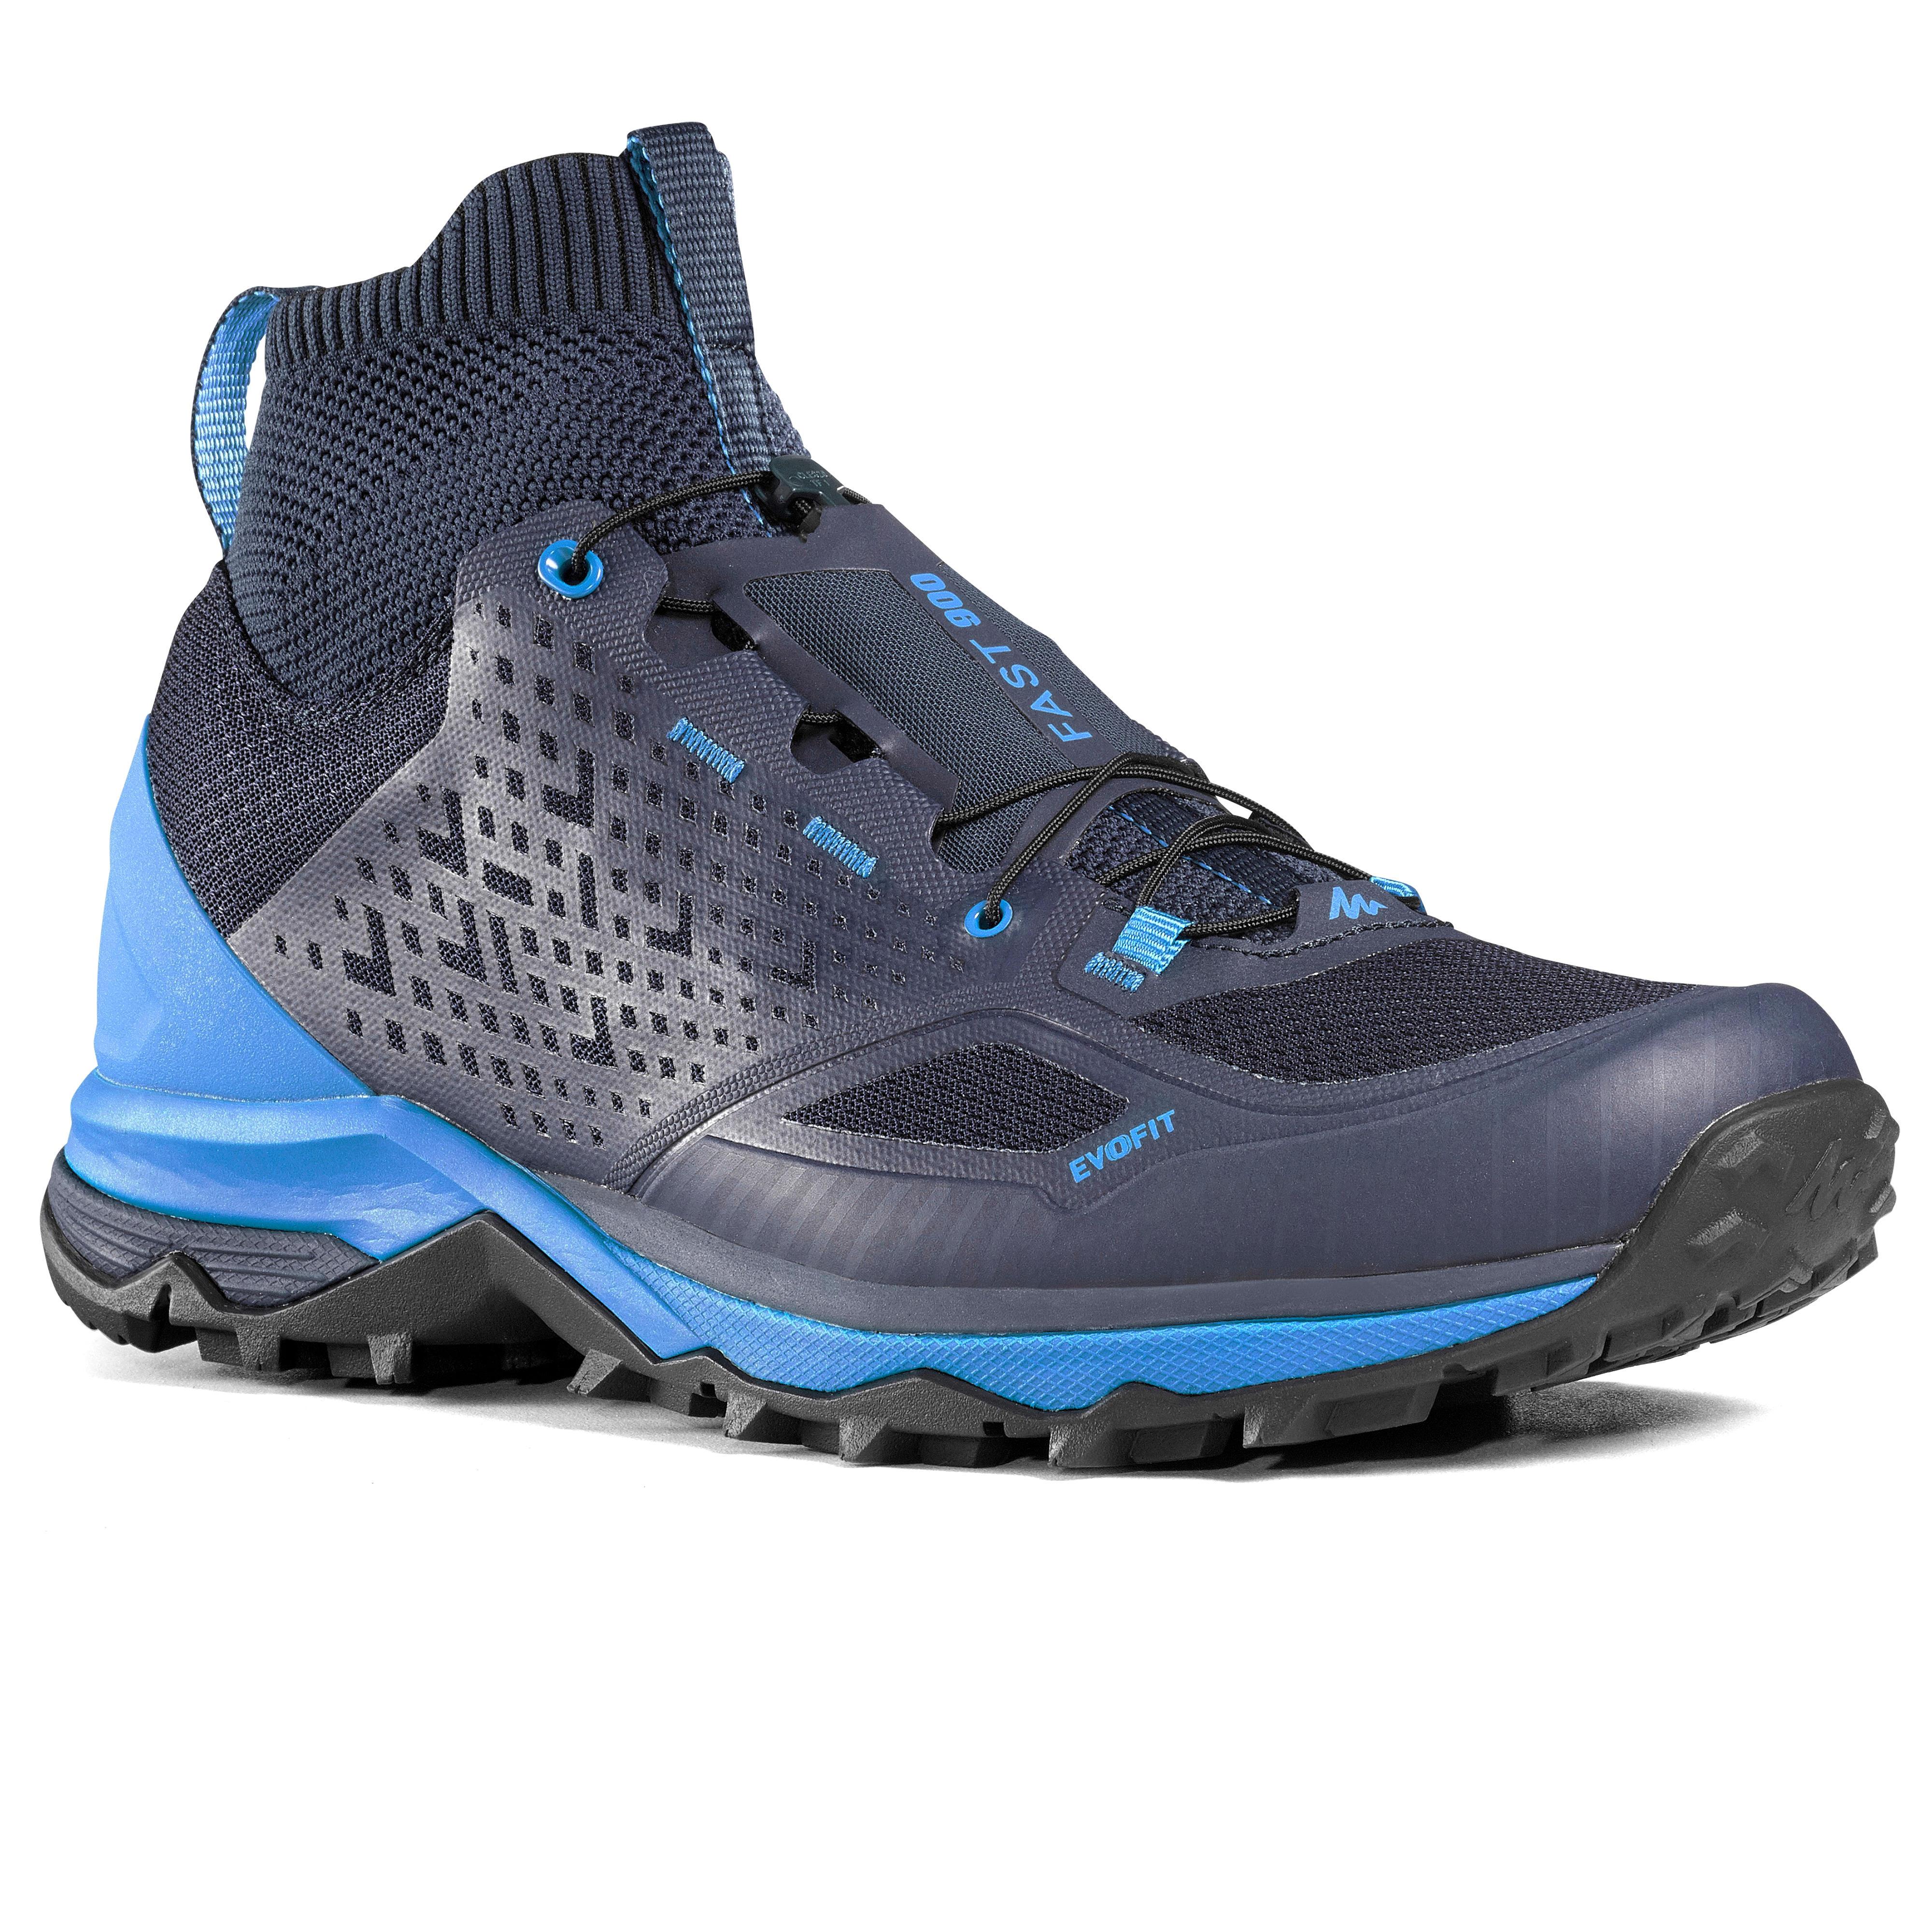 Men's Hiking Shoes | Waterproof